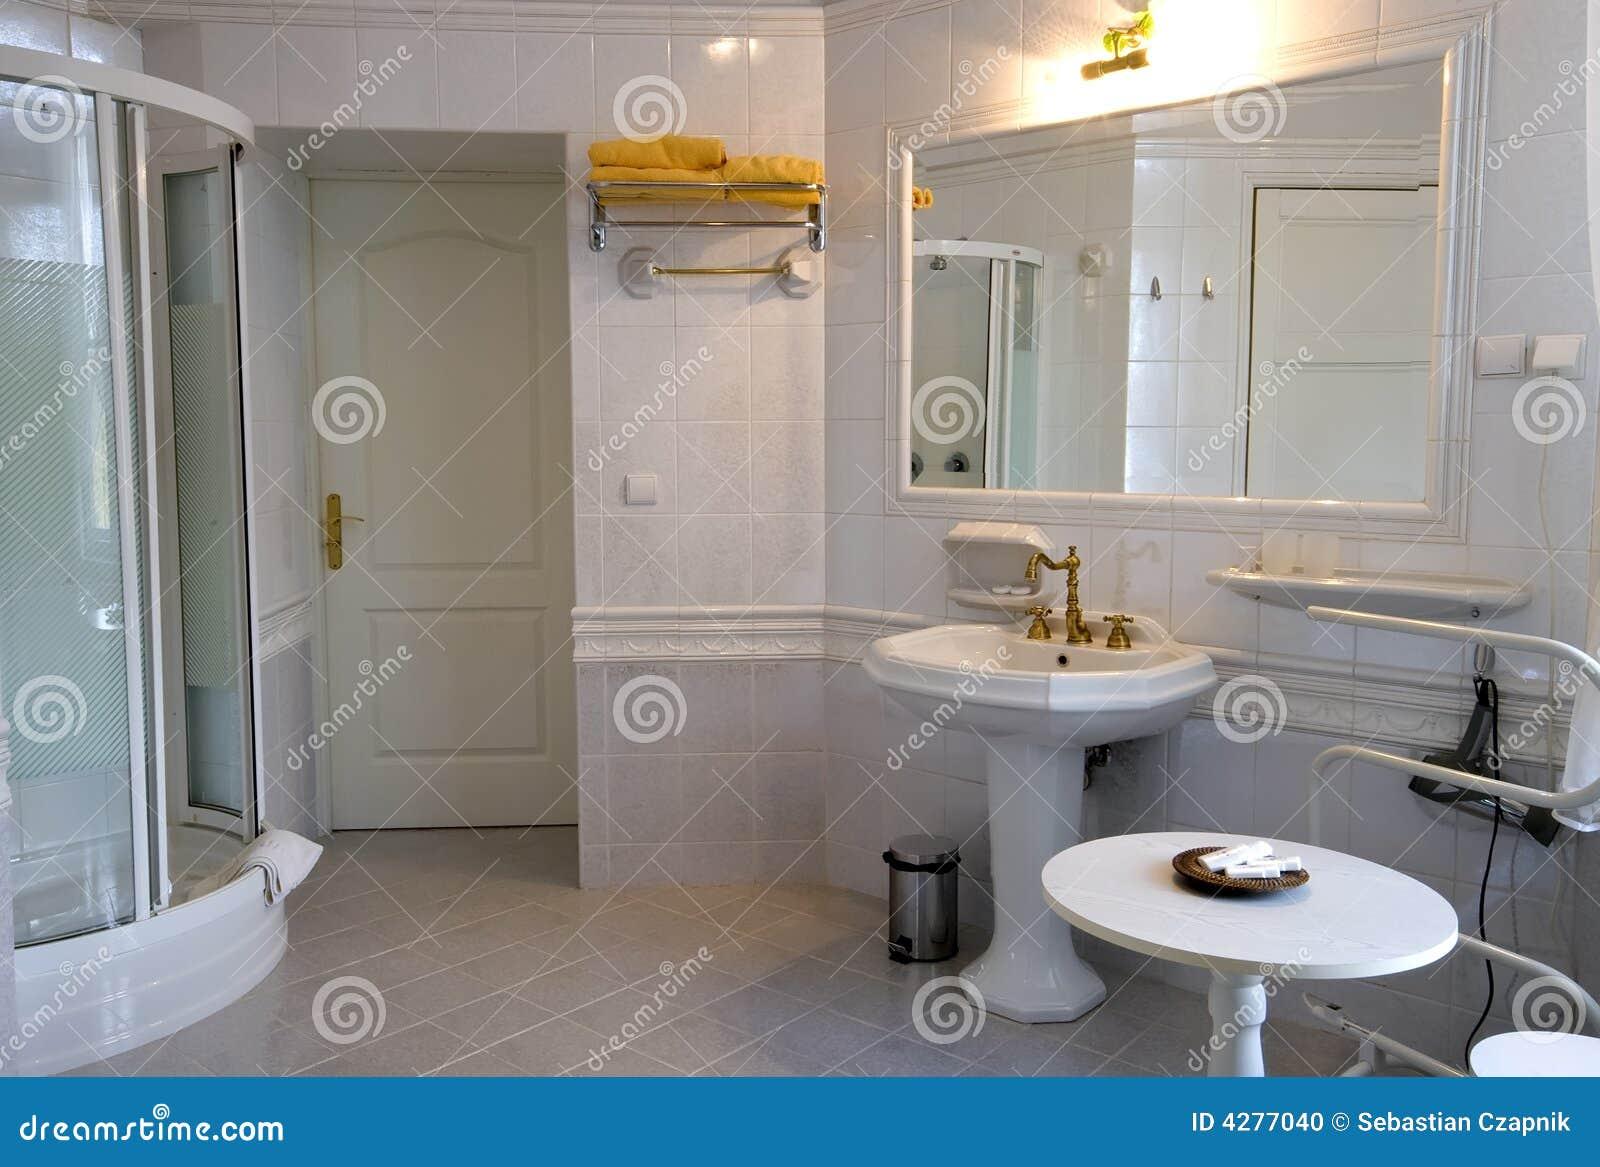 Salle de bains blanche photo stock image du palais pi ce 4277040 - Salle de bain toute blanche ...